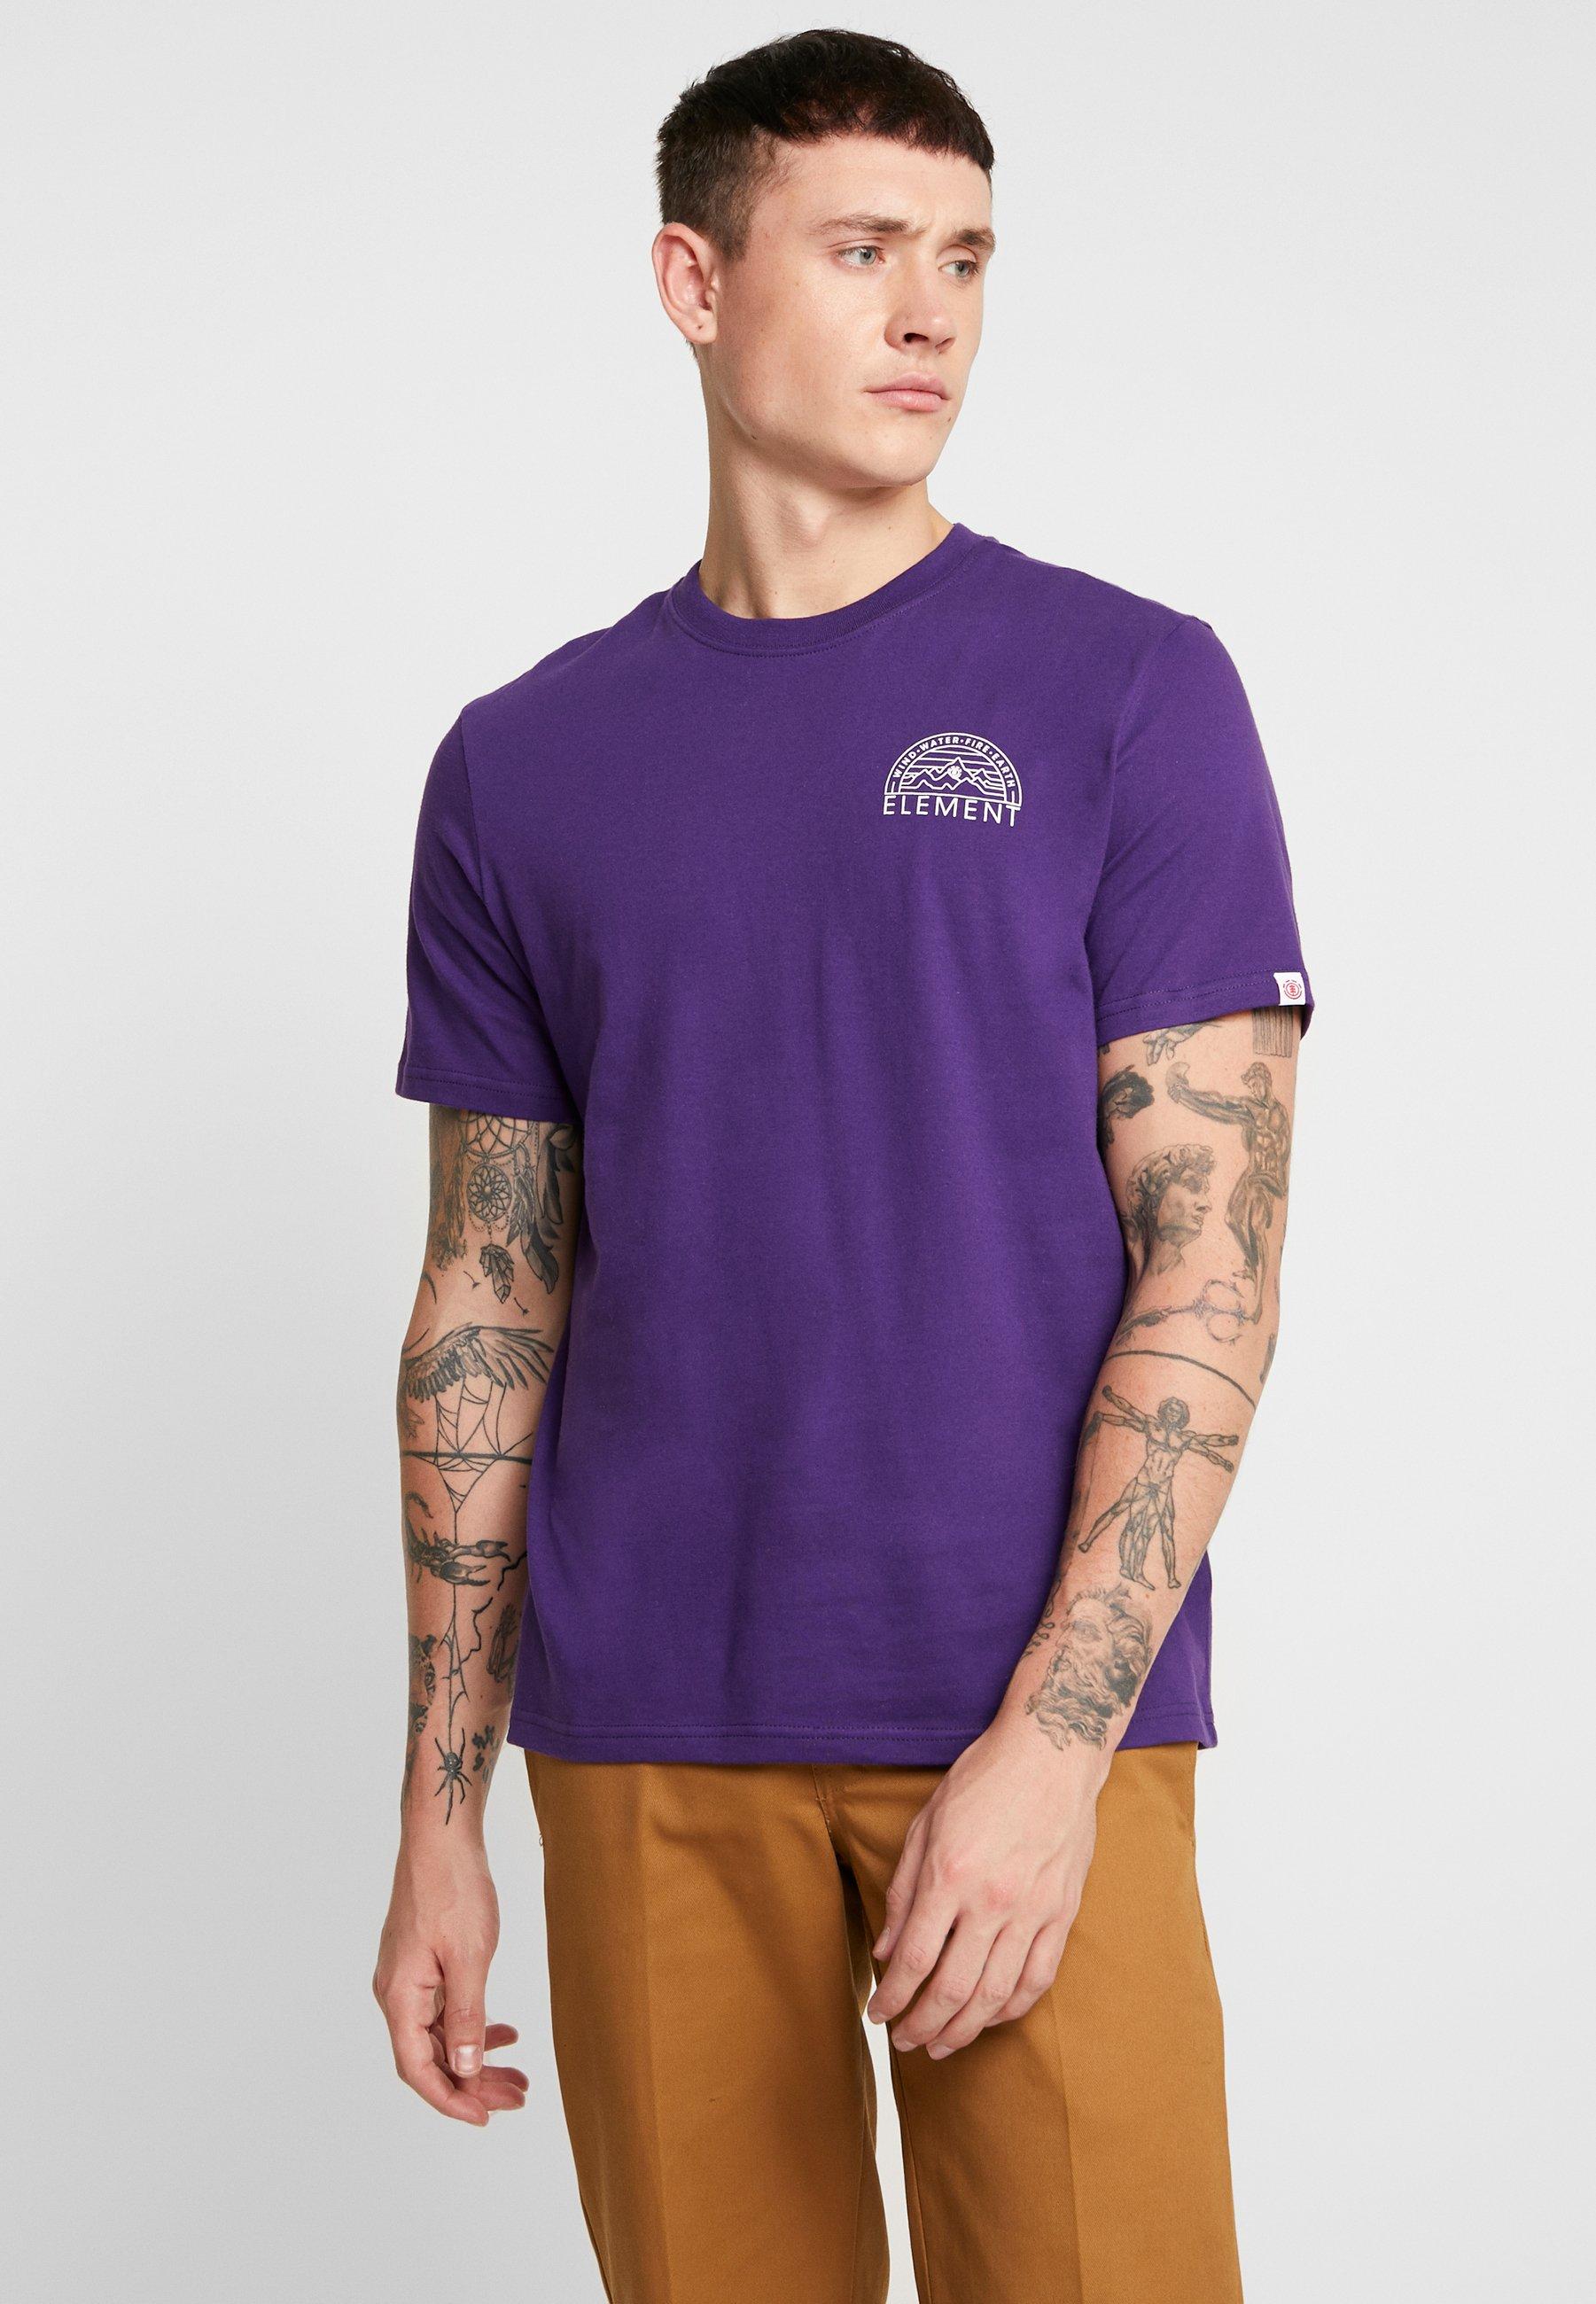 Imprimé Imprimé Element shirt OdysseyT OdysseyT shirt Acai Element srCQdxth